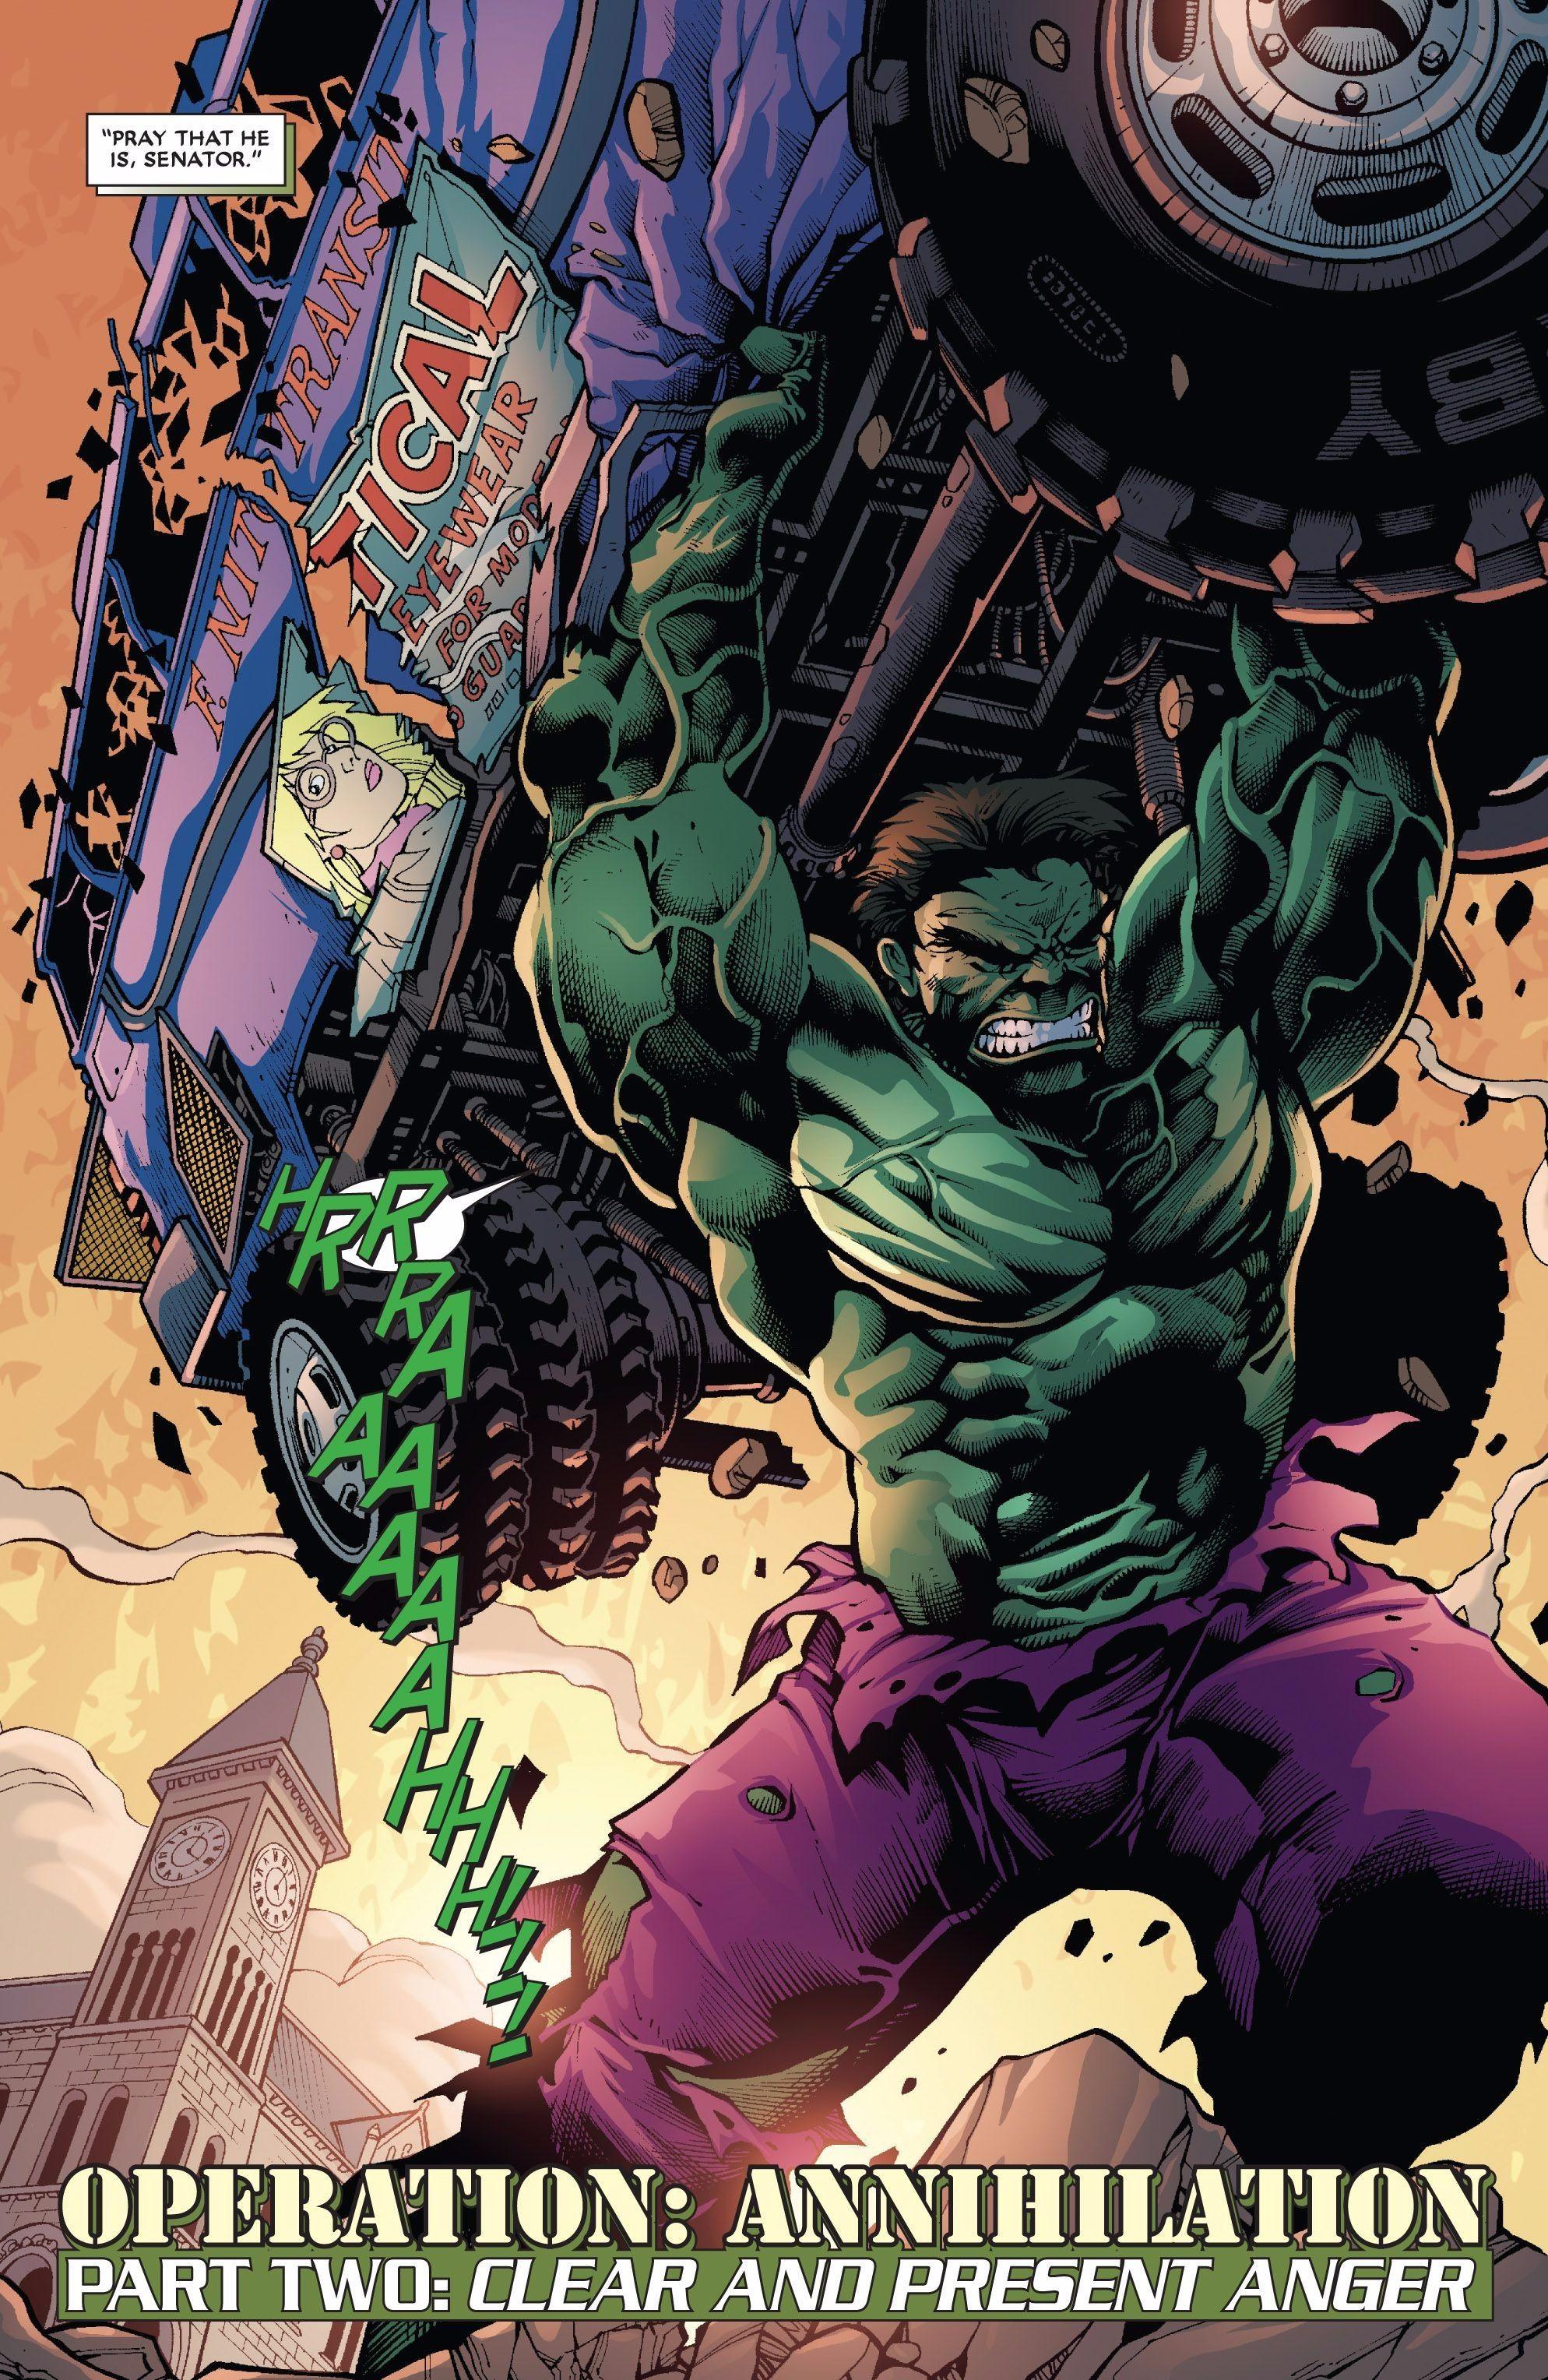 #Hulk #Fan #Art. (HULK VS DEADPOOL IN: Deadpool Vol.2 #38 ART) By: Dalibor Talajic. ÅWESOMENESS!!!™ ÅÅÅ+